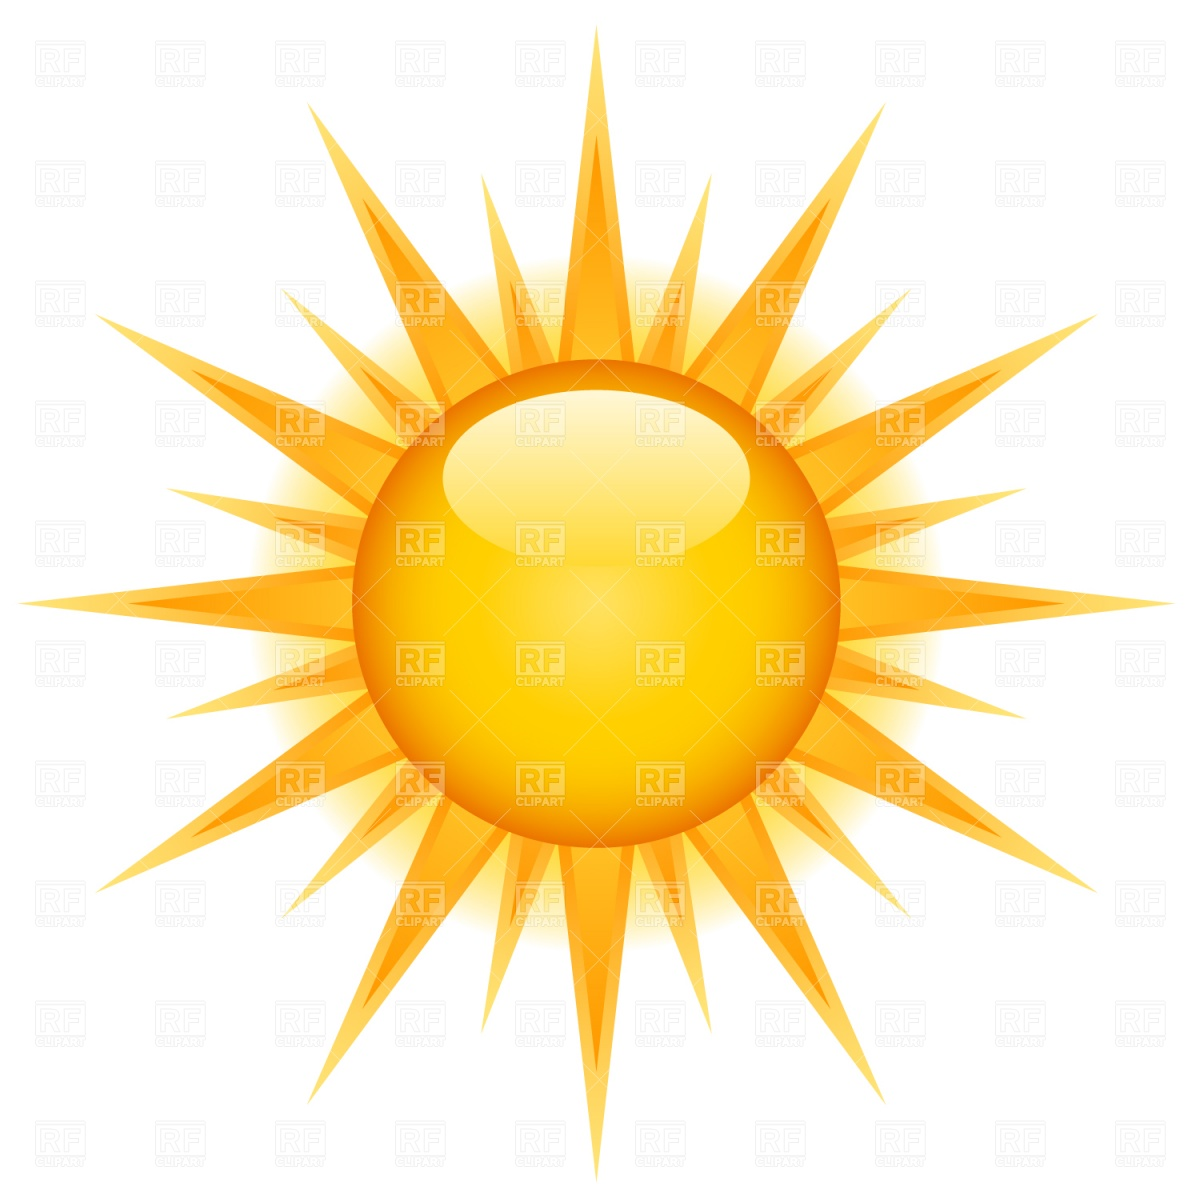 Free Sun Vector Free, Download Free Clip Art, Free Clip Art.